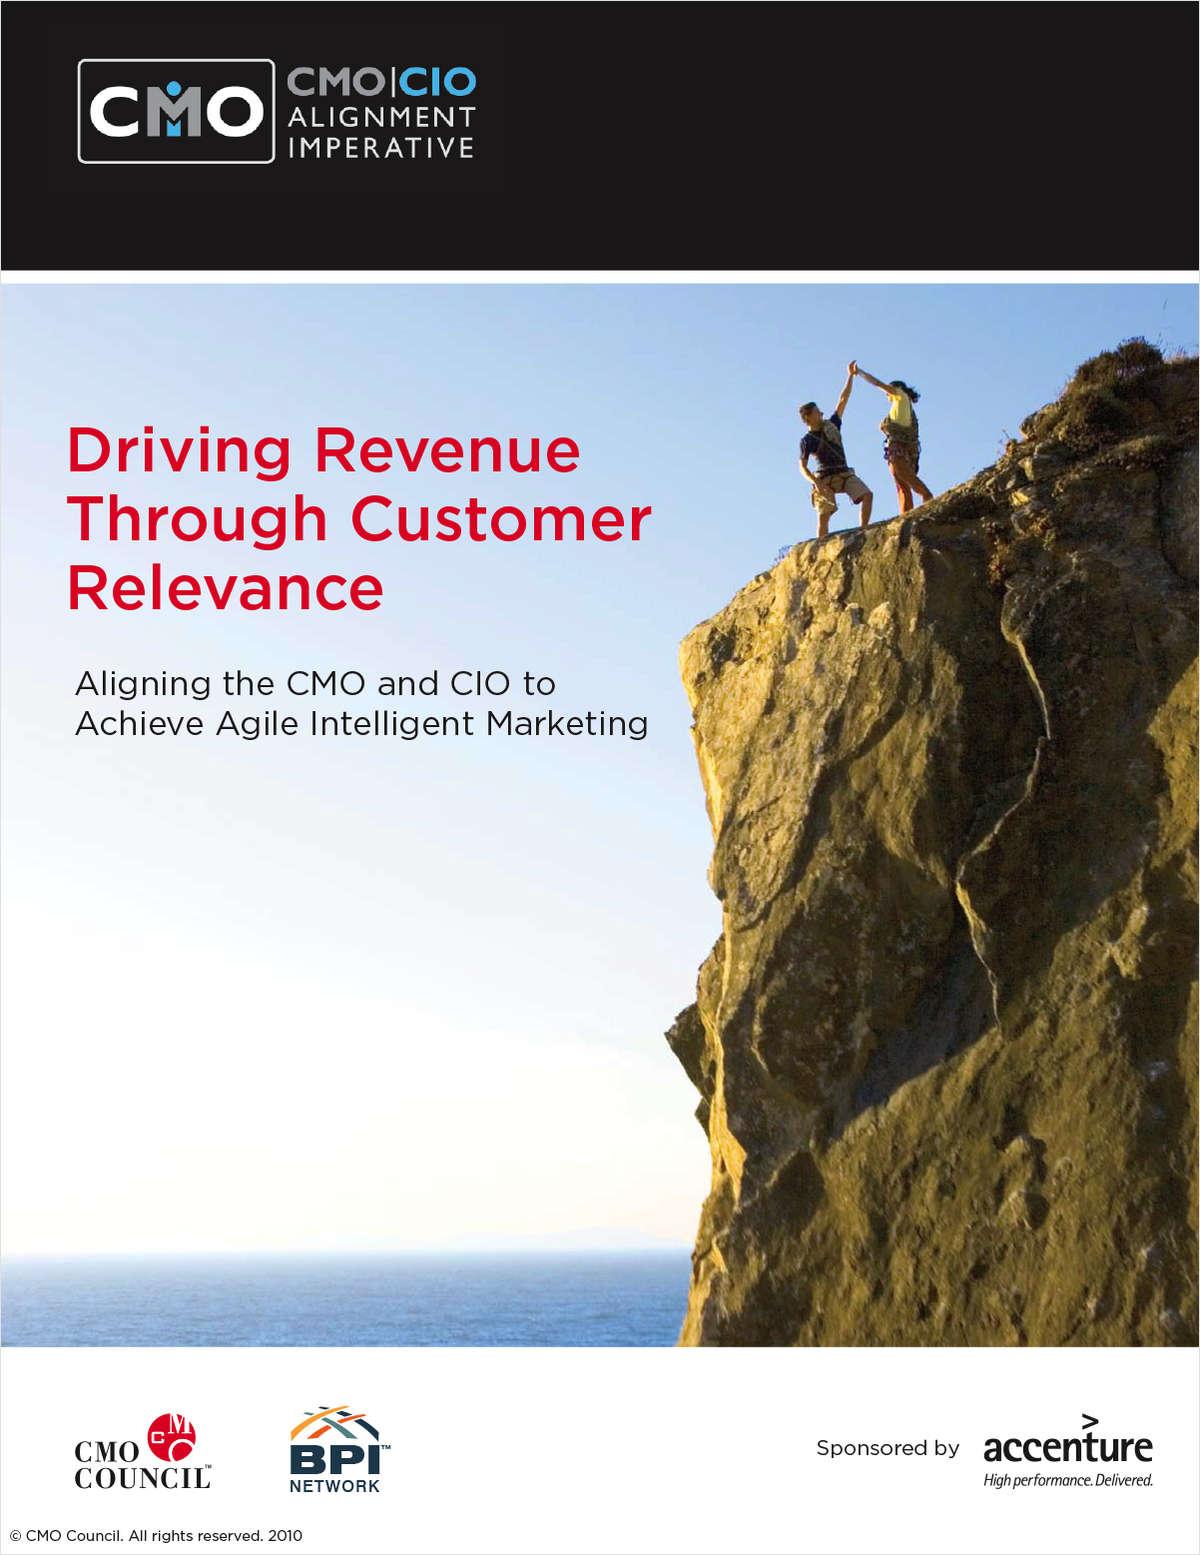 Driving Revenue through Customer Relevance